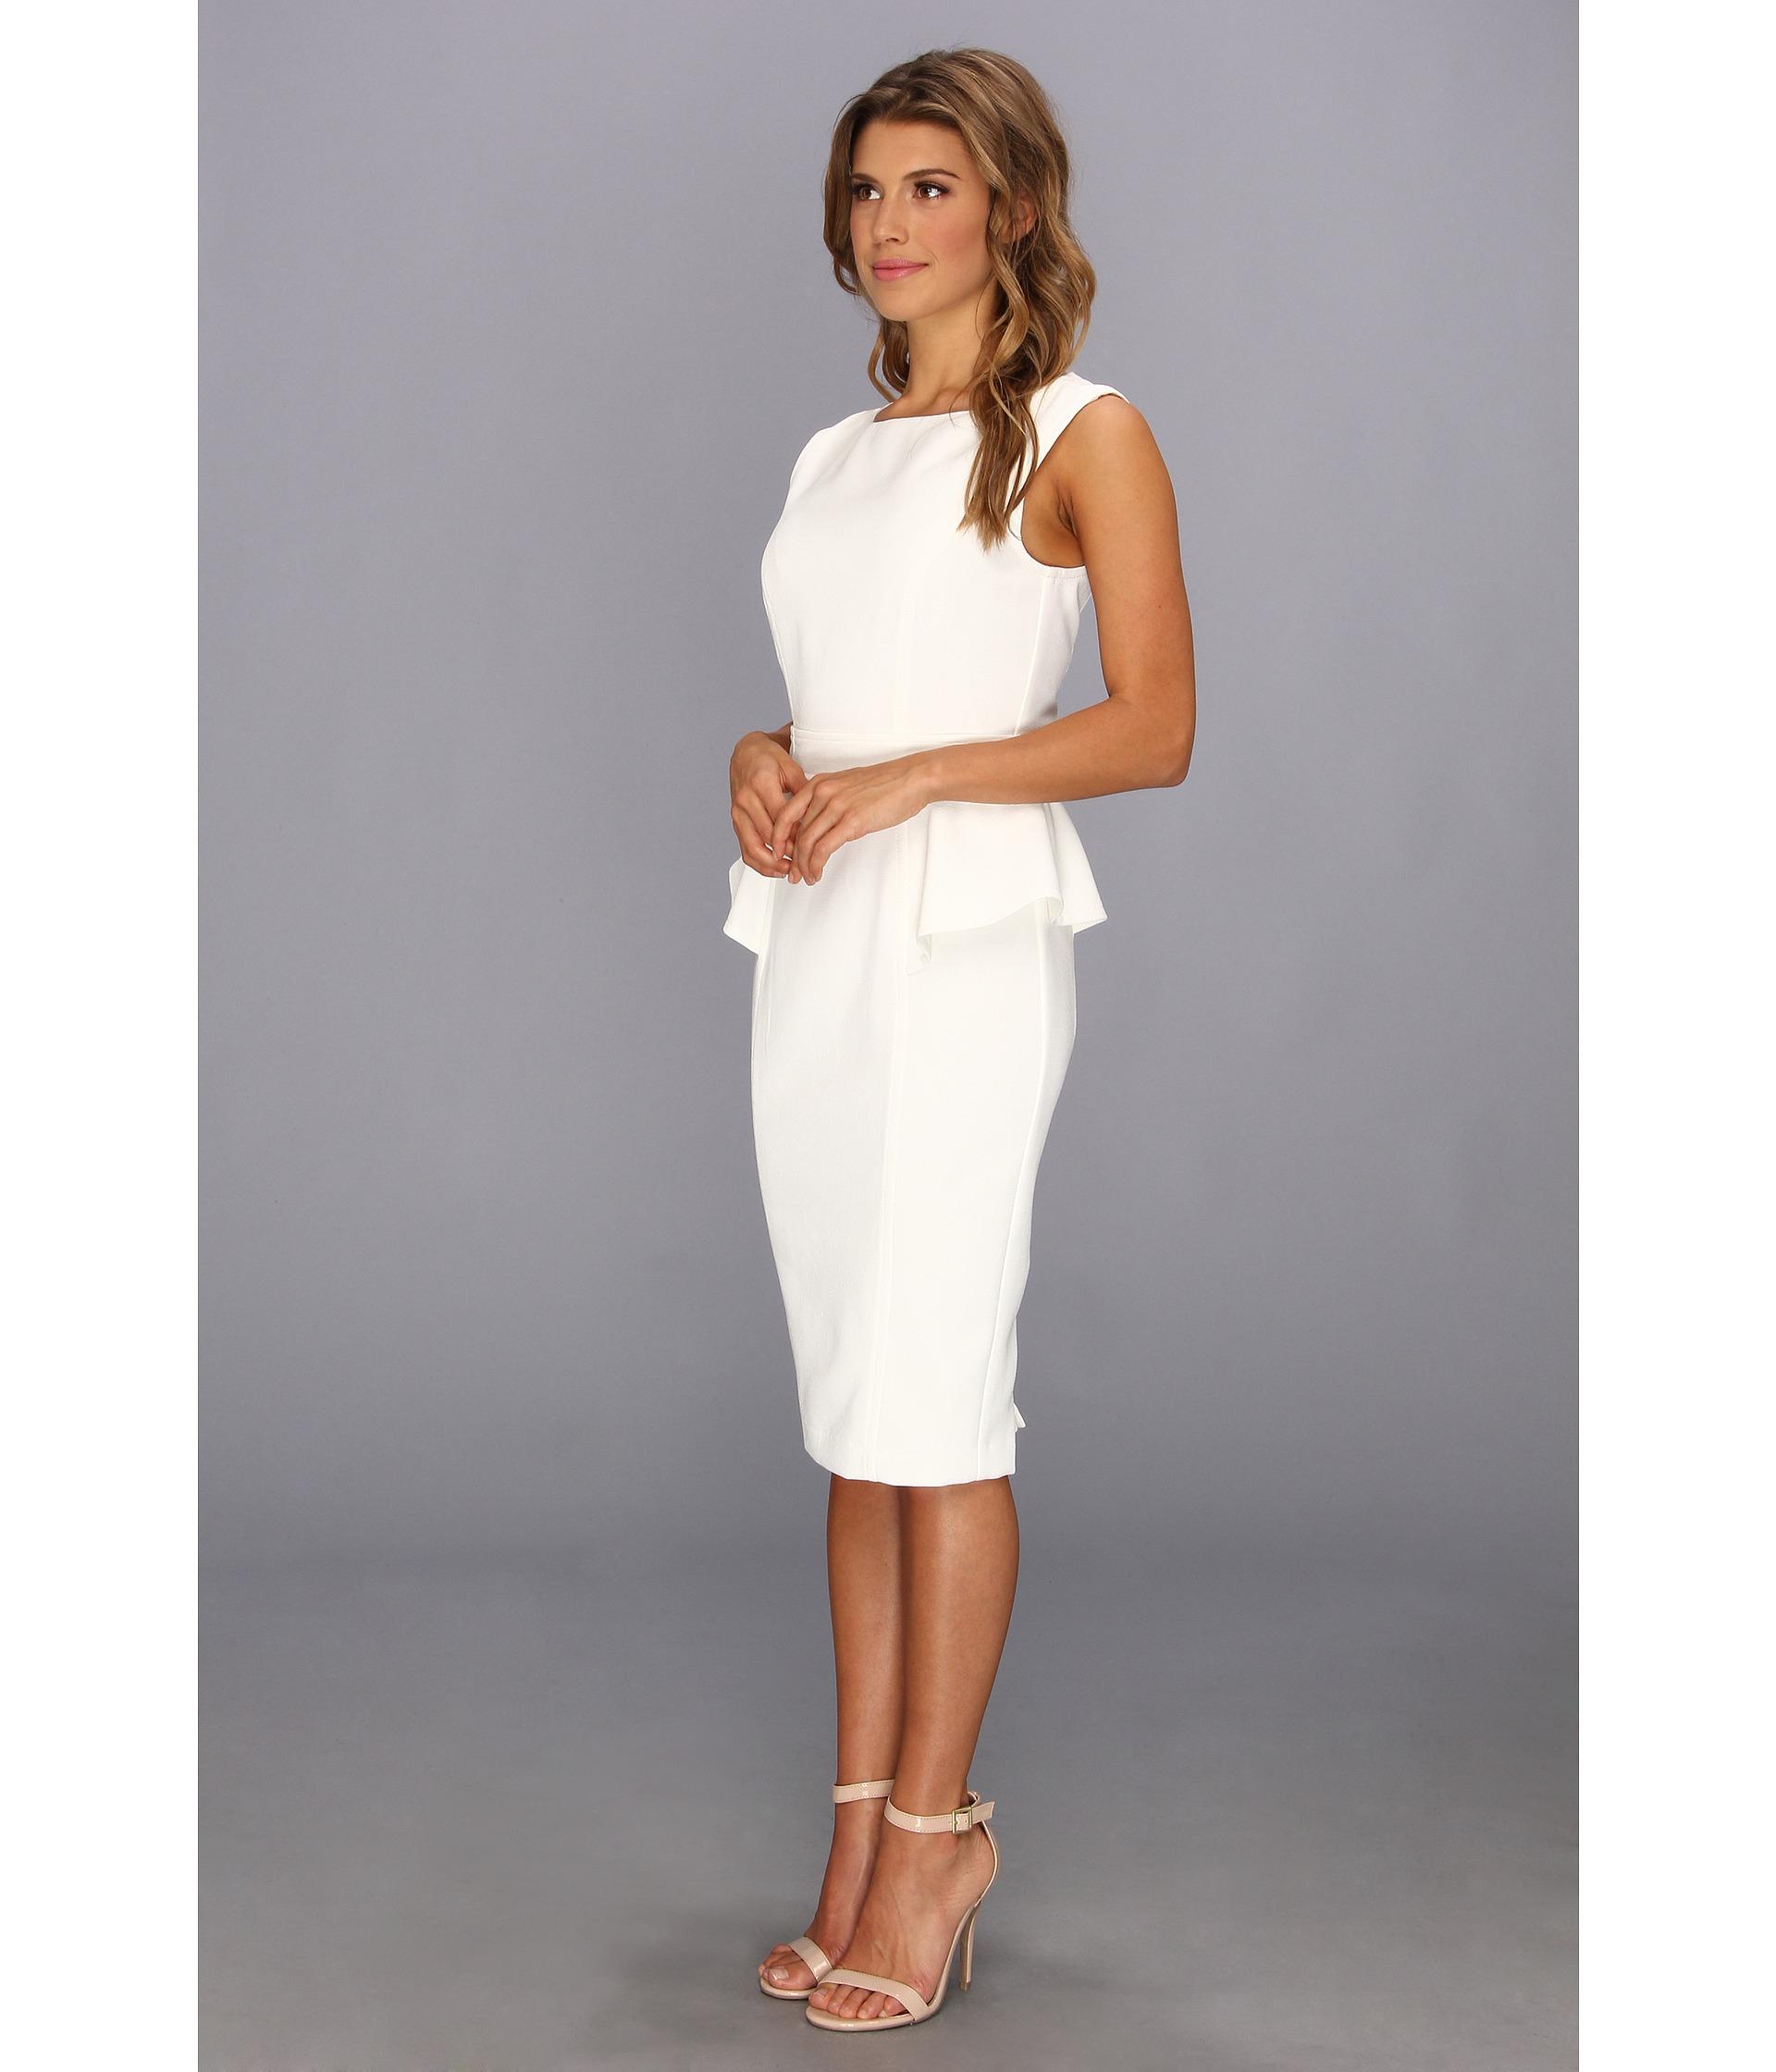 Badgley mischka Pebble Crepe Peplum Cocktail Dress in White  Lyst